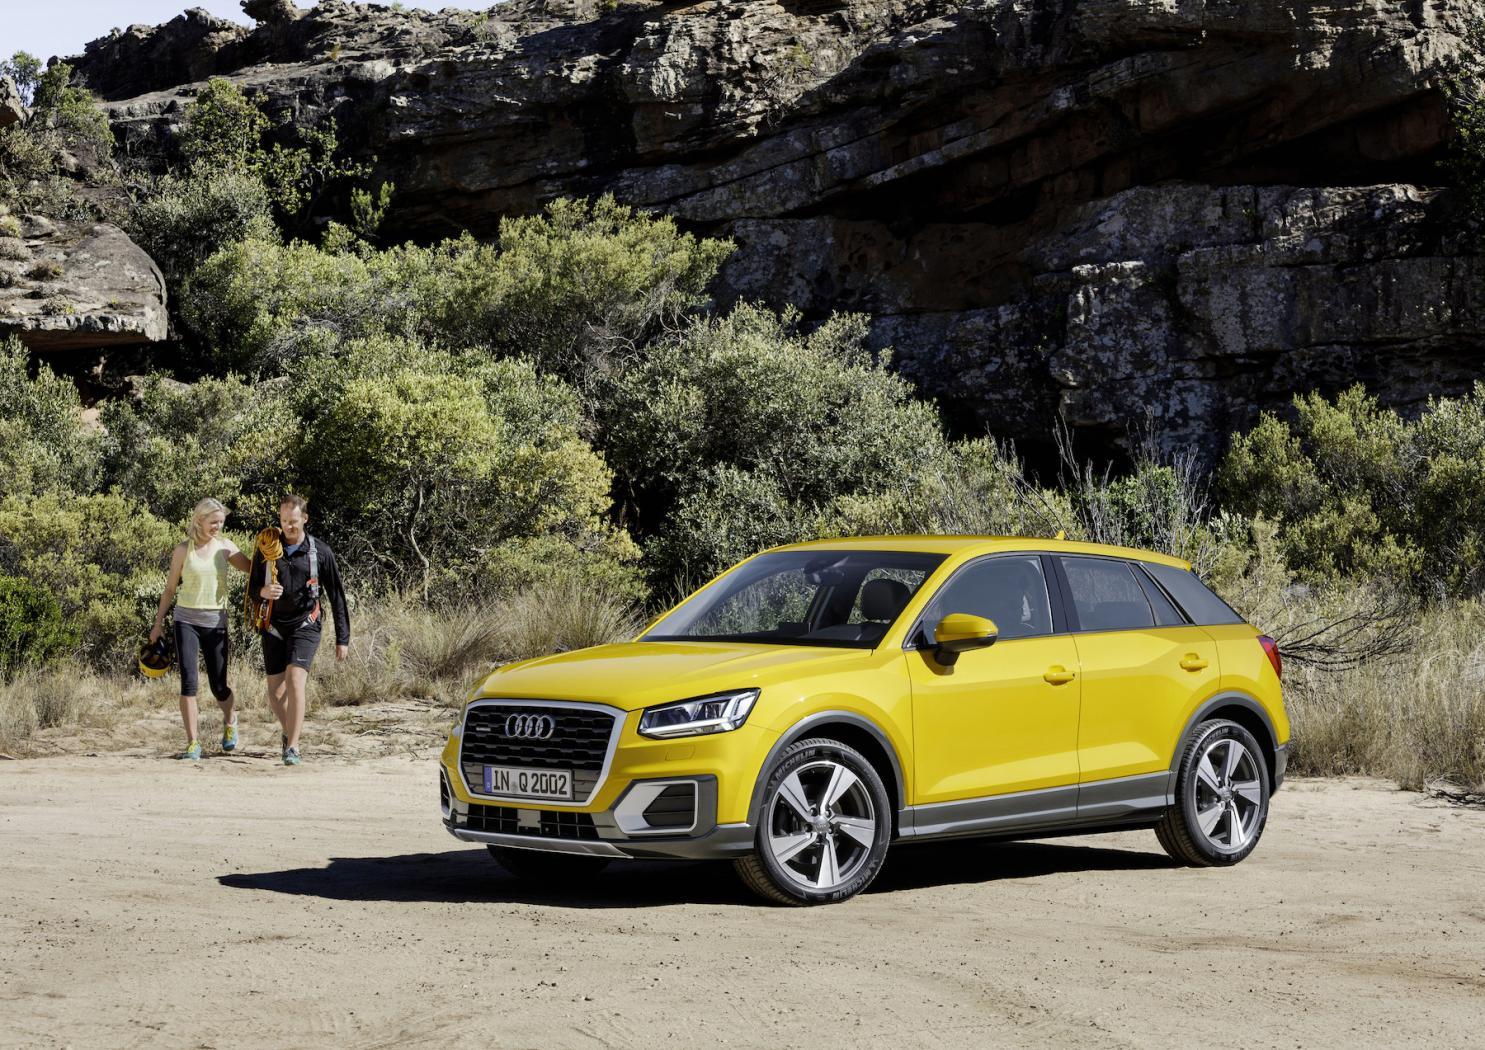 Audi-Q2-Fiche-occasion-6.jpeg